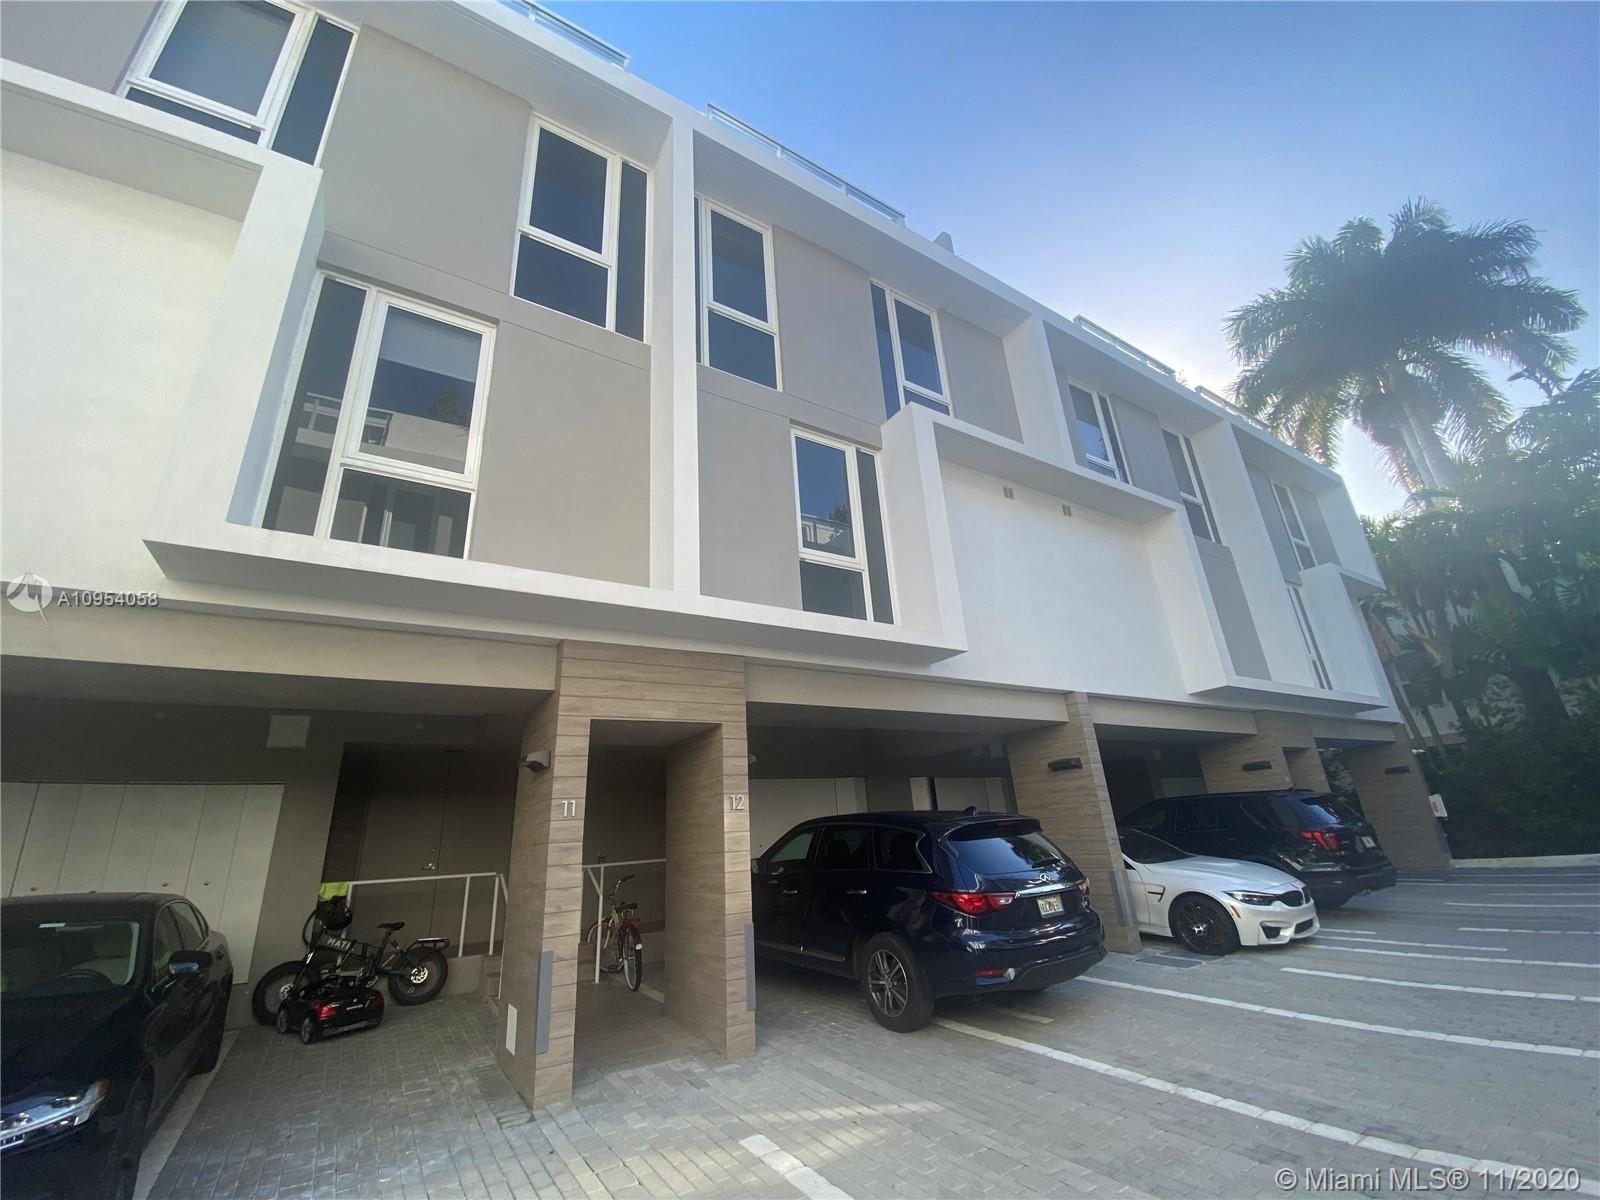 9890 E Bay Harbor Dr #th12, Bay Harbor Islands, FL 33154 - #: A10954058